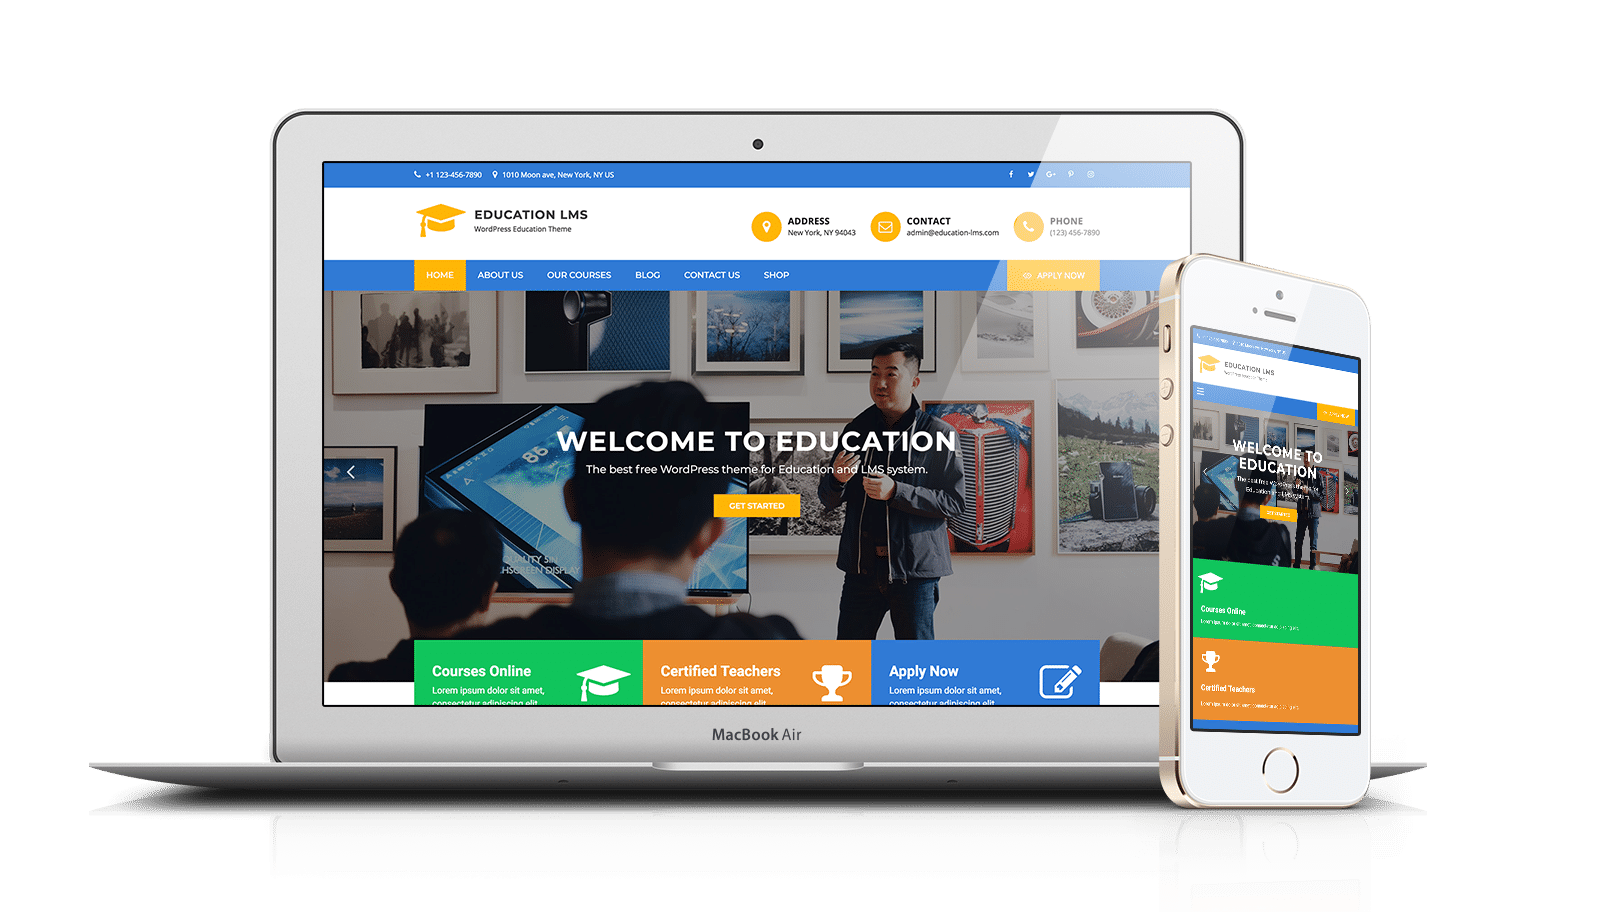 Education LMS Pro WordPress Theme - FilaThemes